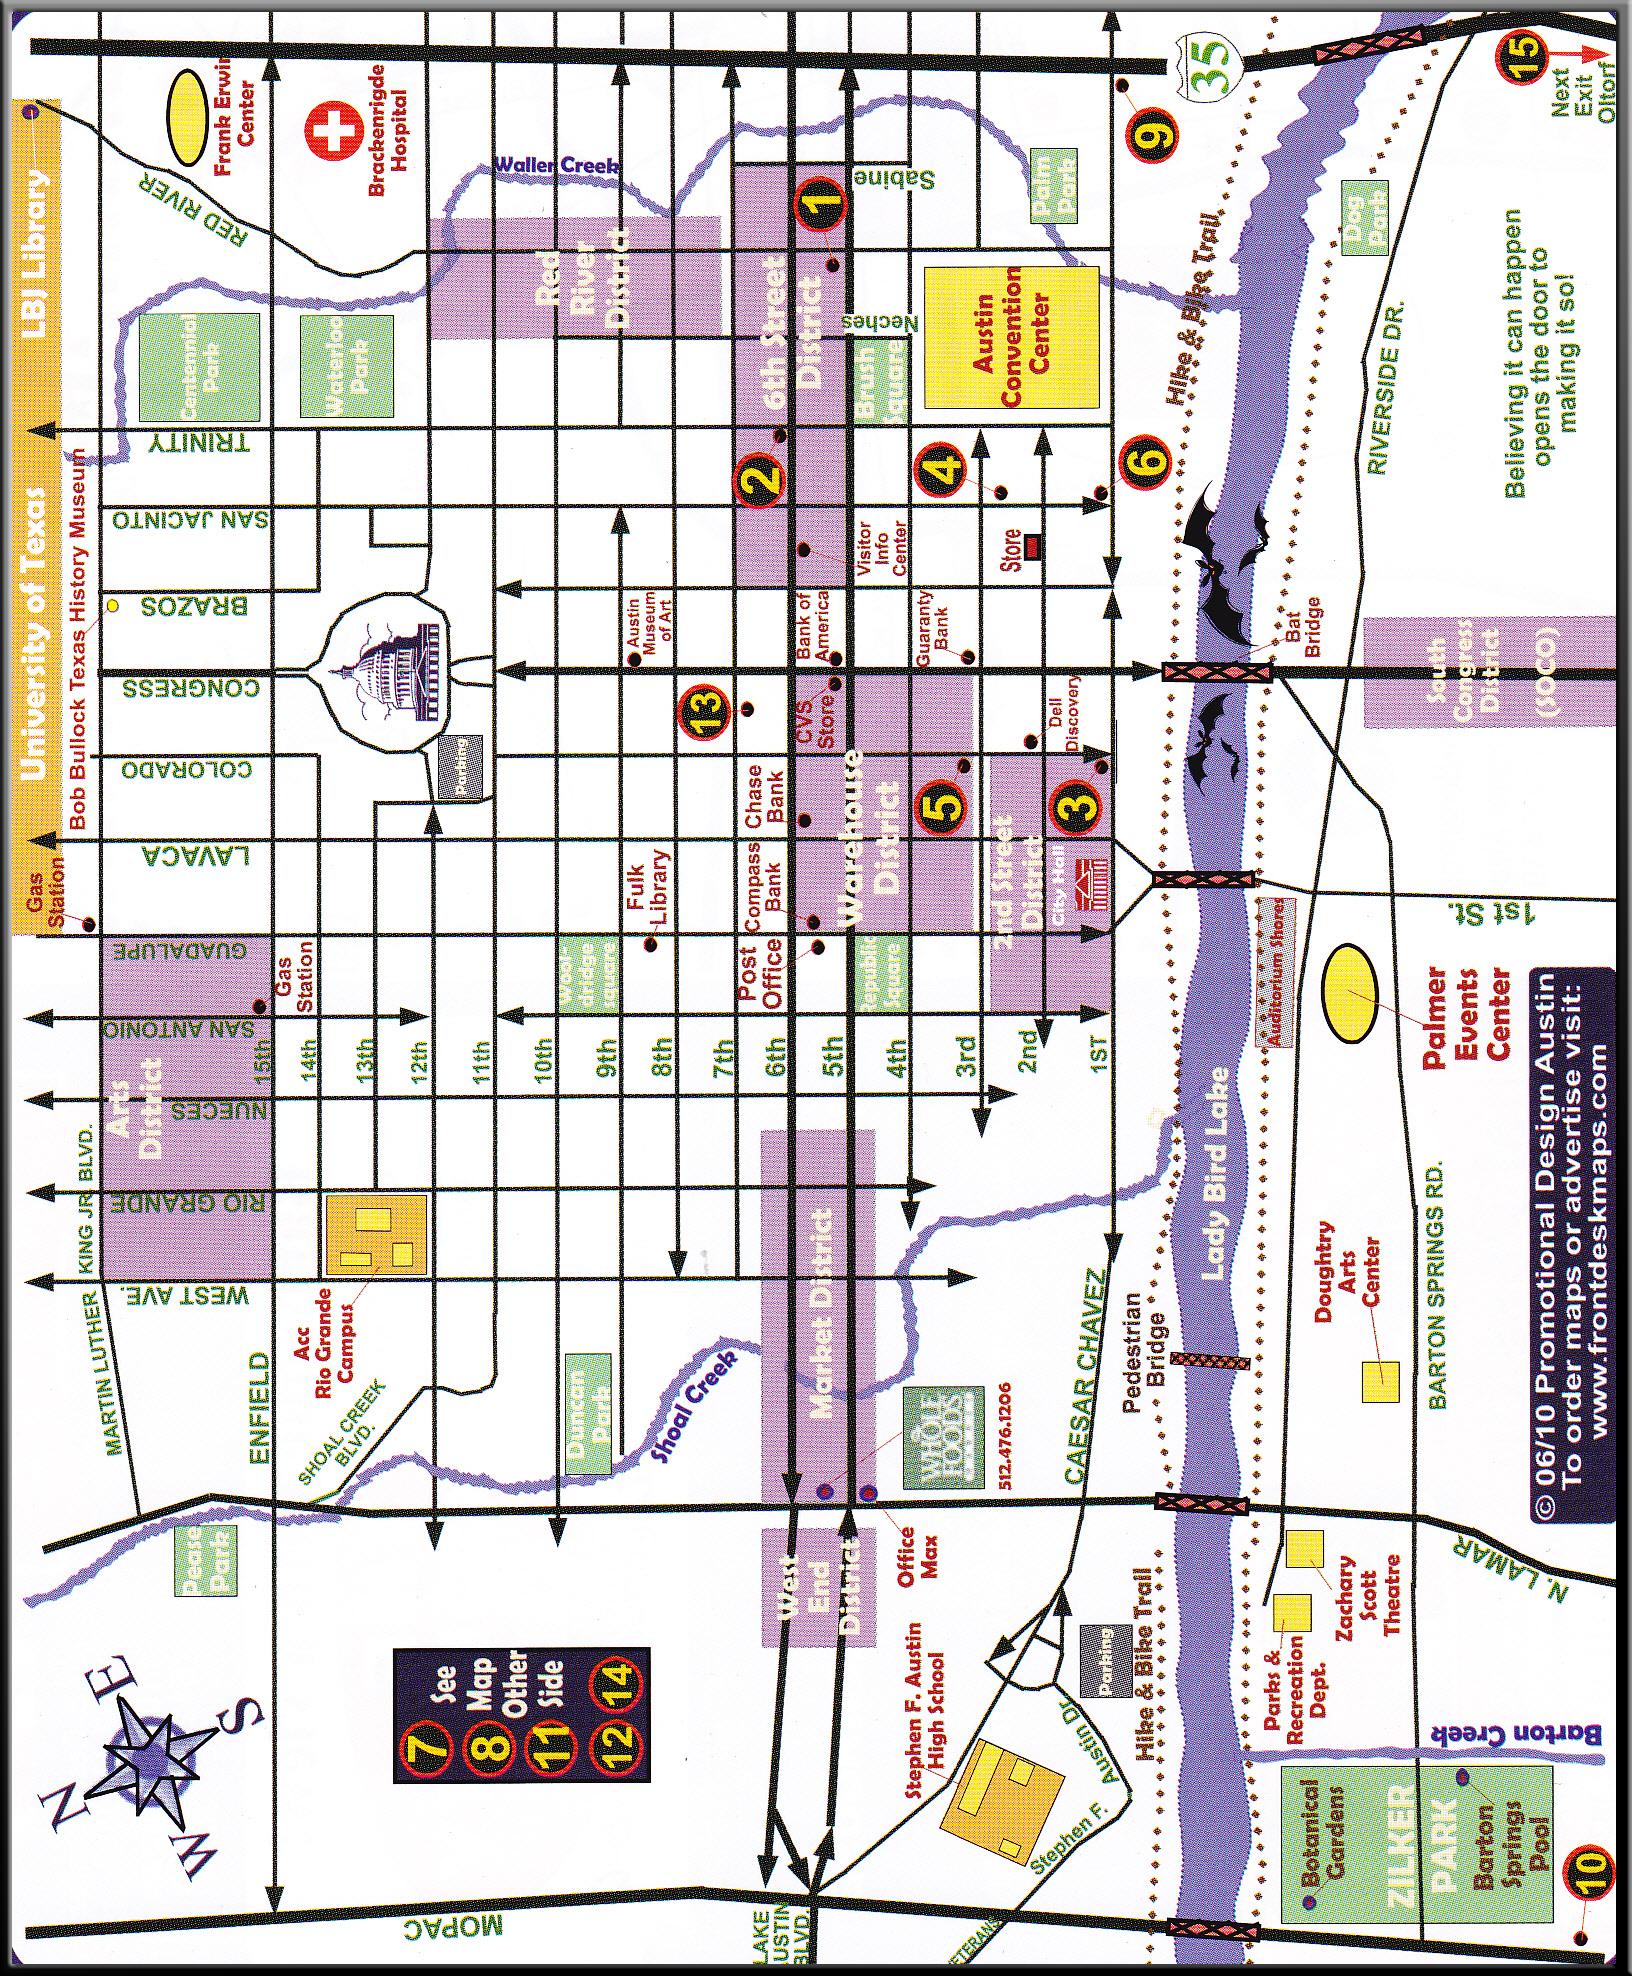 Street Map Of Austin Texas | Business Ideas 2013 - Austin Texas Map Downtown